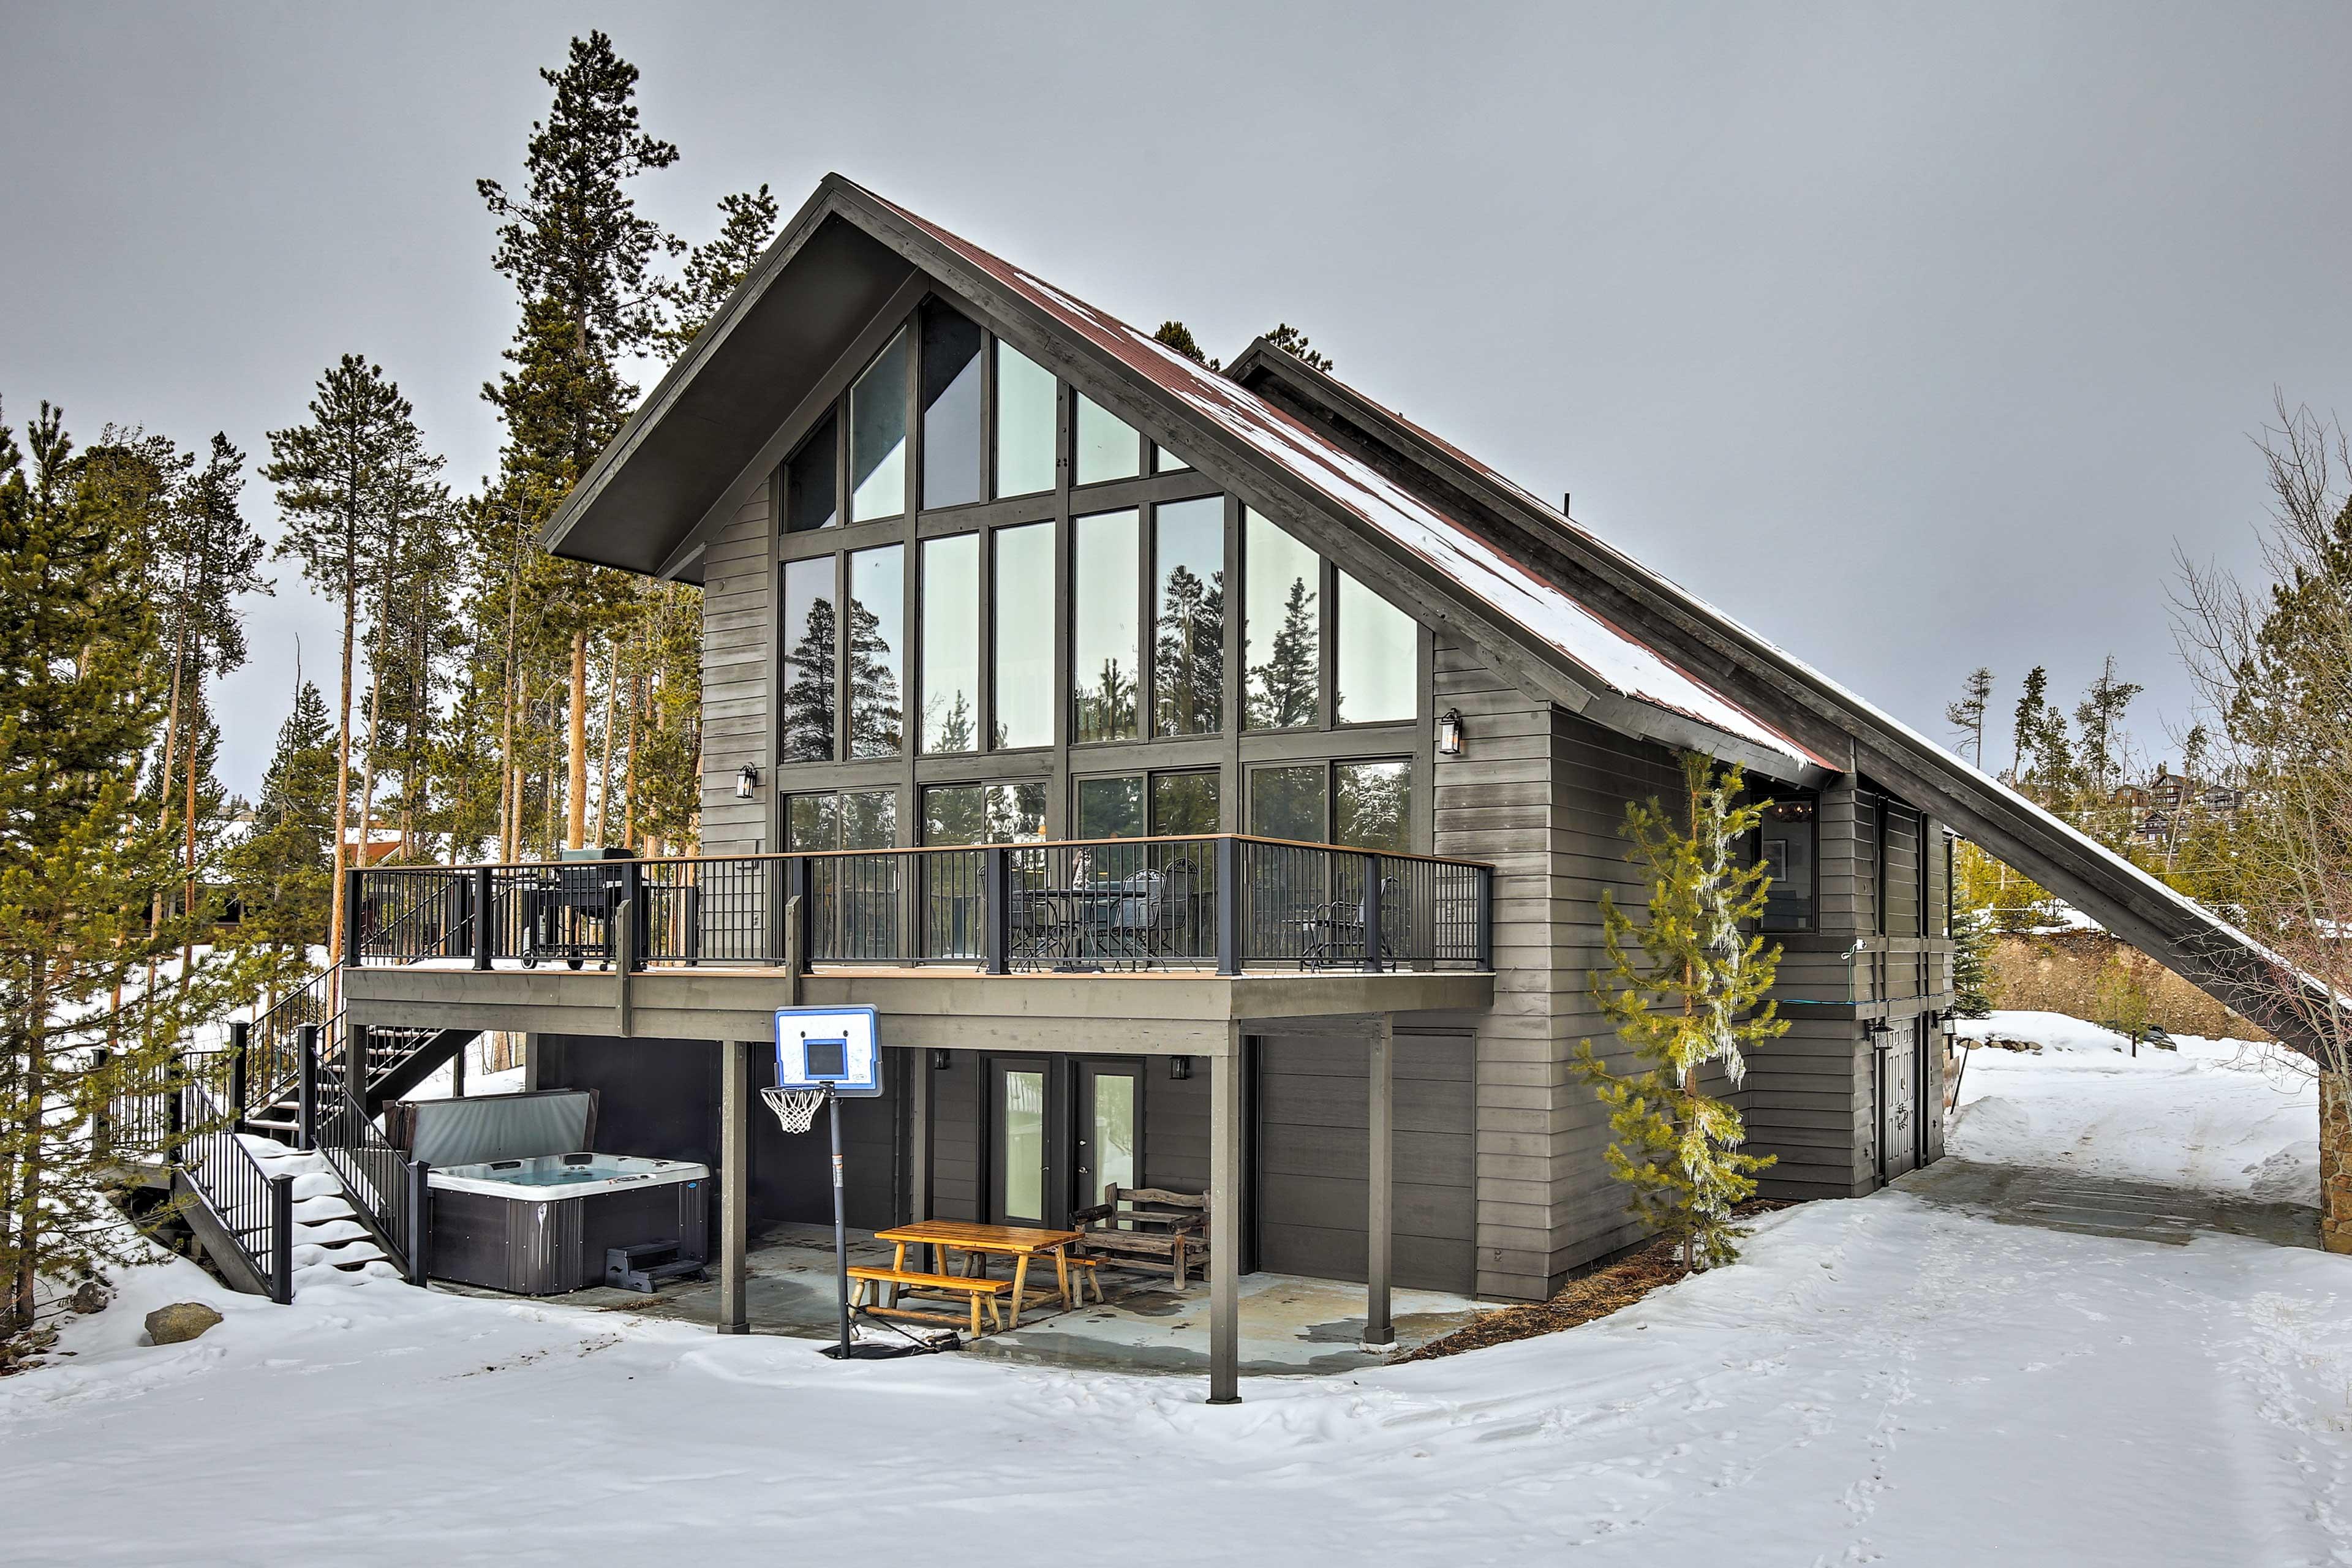 Grand Lake is a stunning all-season destination!